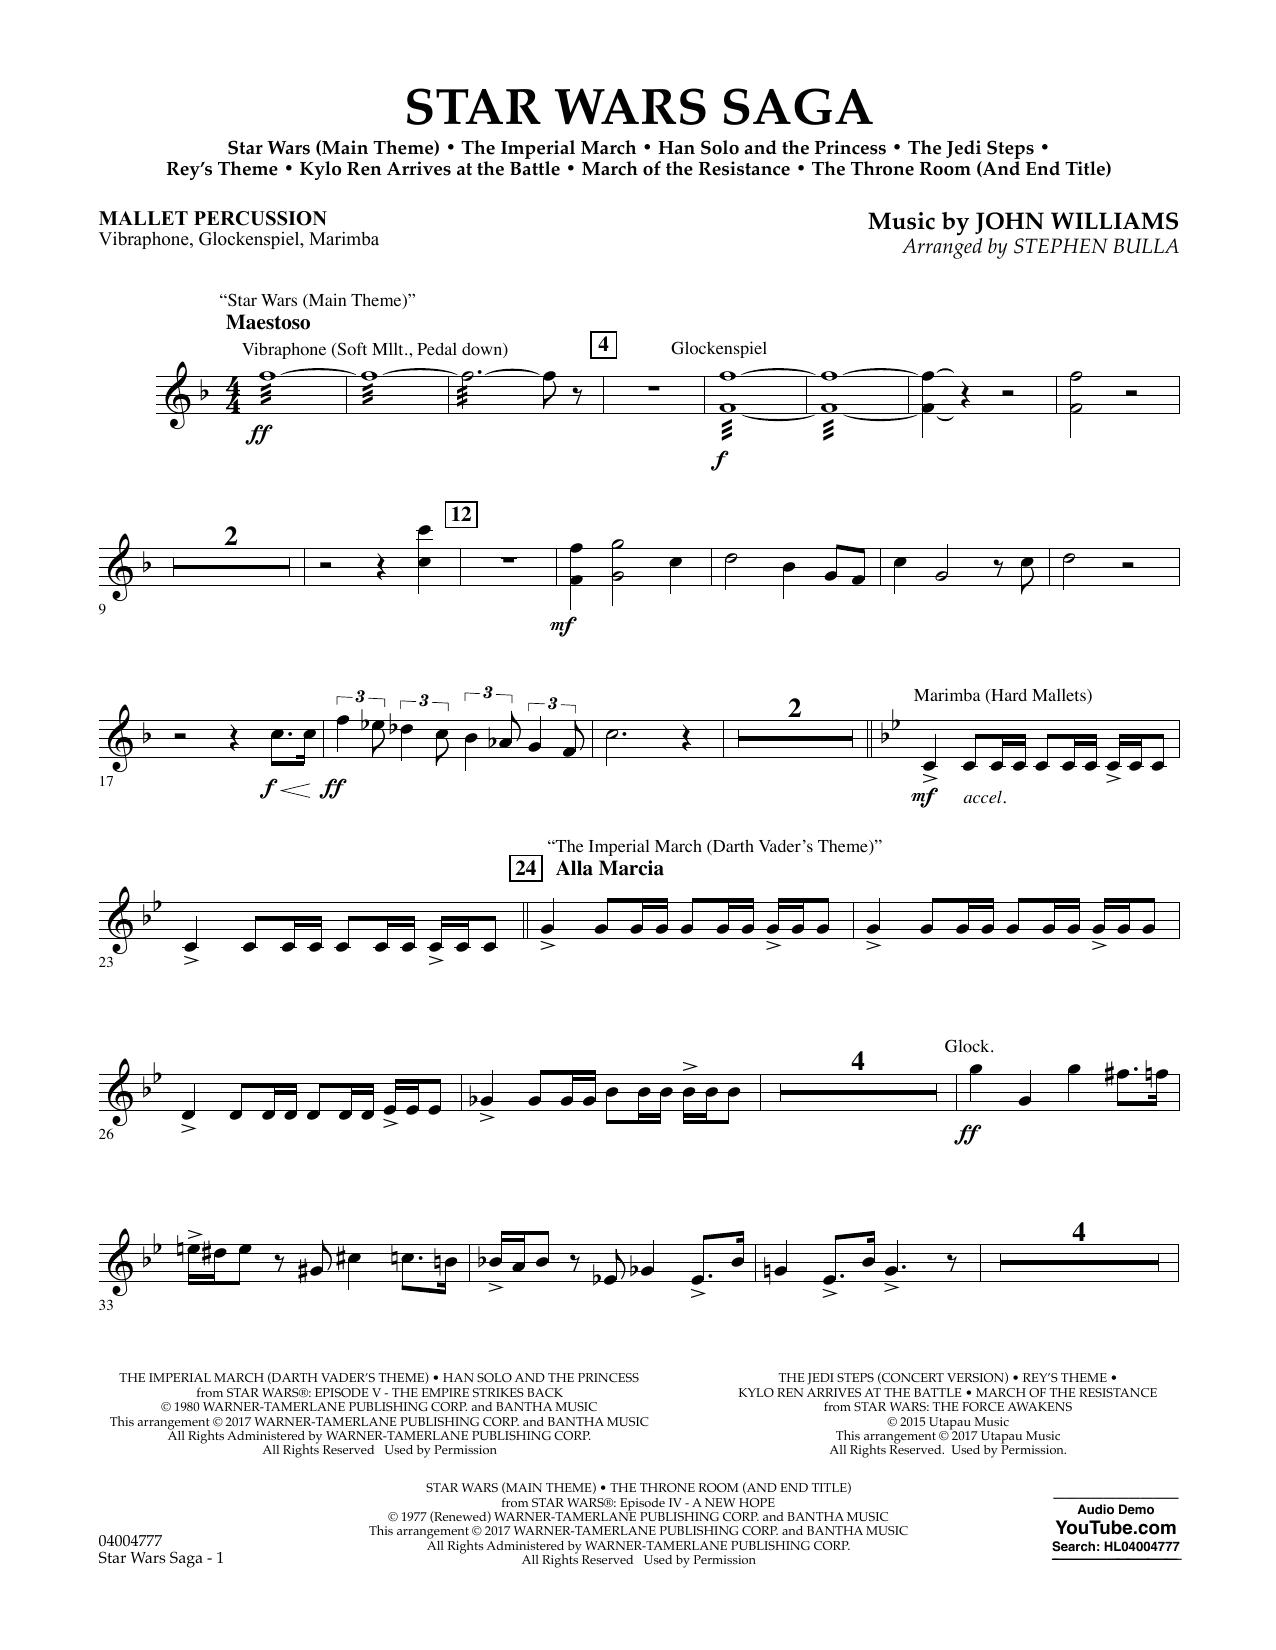 Star Wars Saga - Mallet Percussion Sheet Music